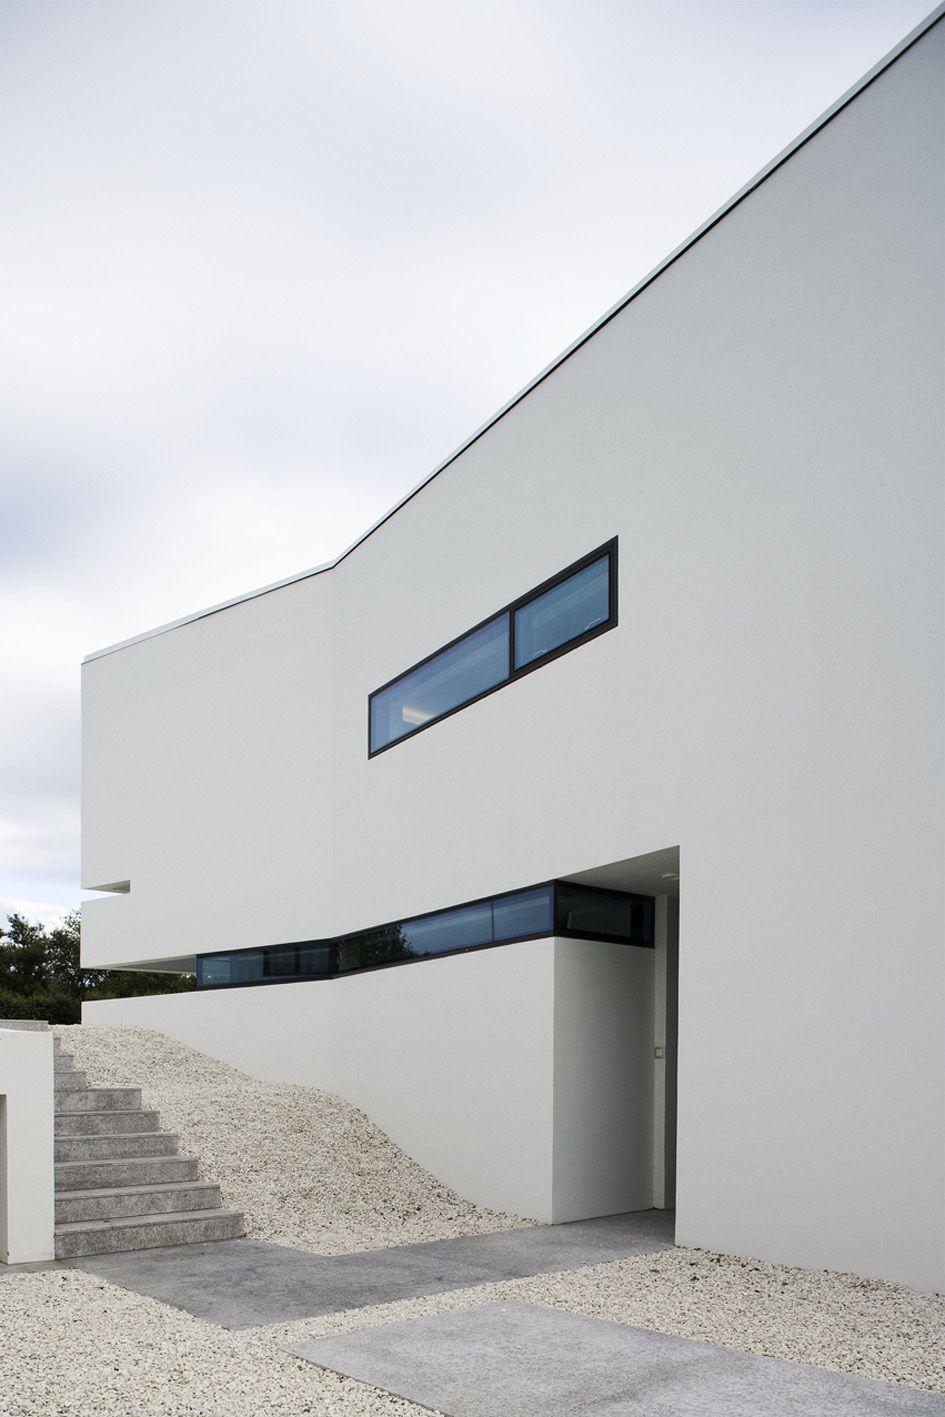 Galeria - Casa B25 / PK Arkitektar - 61